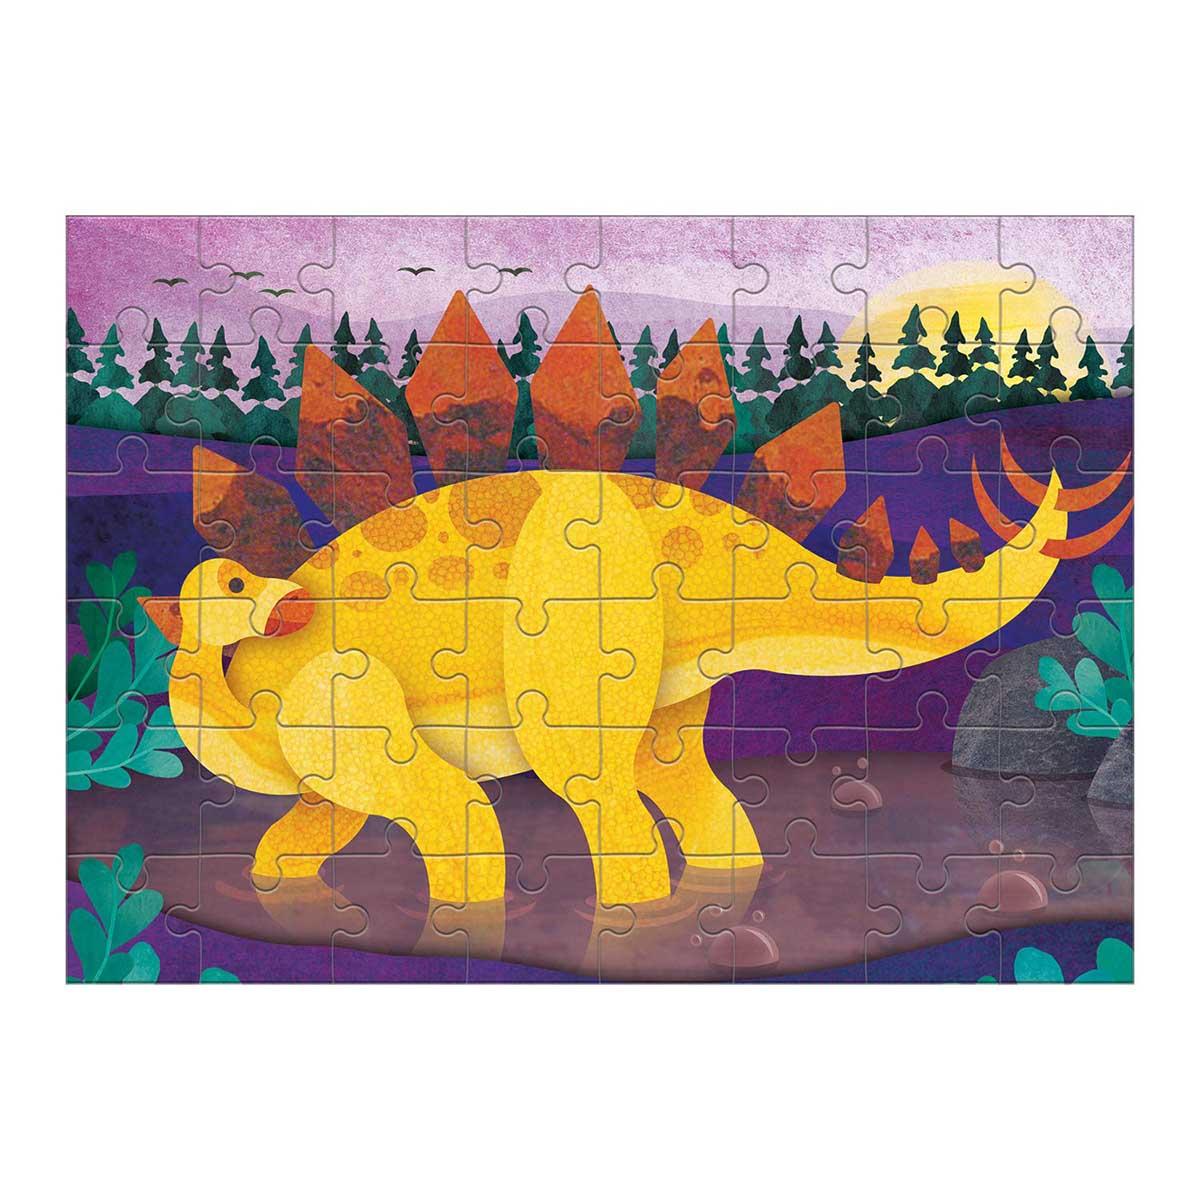 Stegosaurus (Mini) Dinosaurs Jigsaw Puzzle